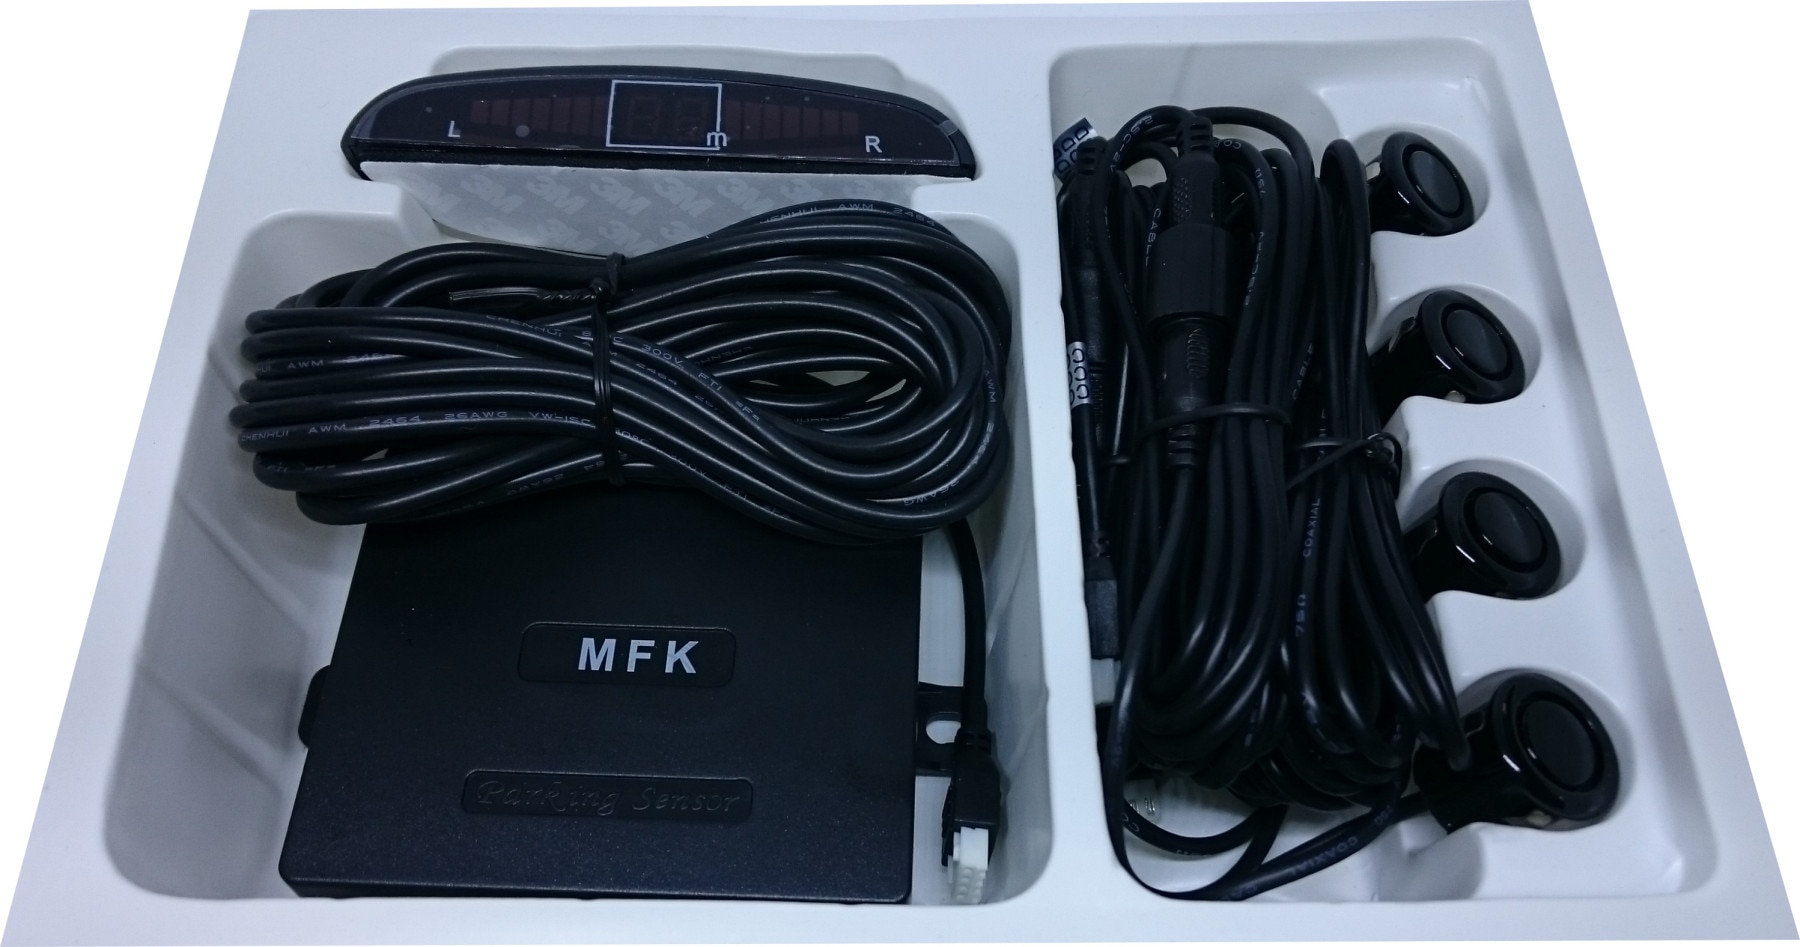 Kit de pantalla de distancia, Sensor de estacionamiento, lente negra de 18mm MFK BE750